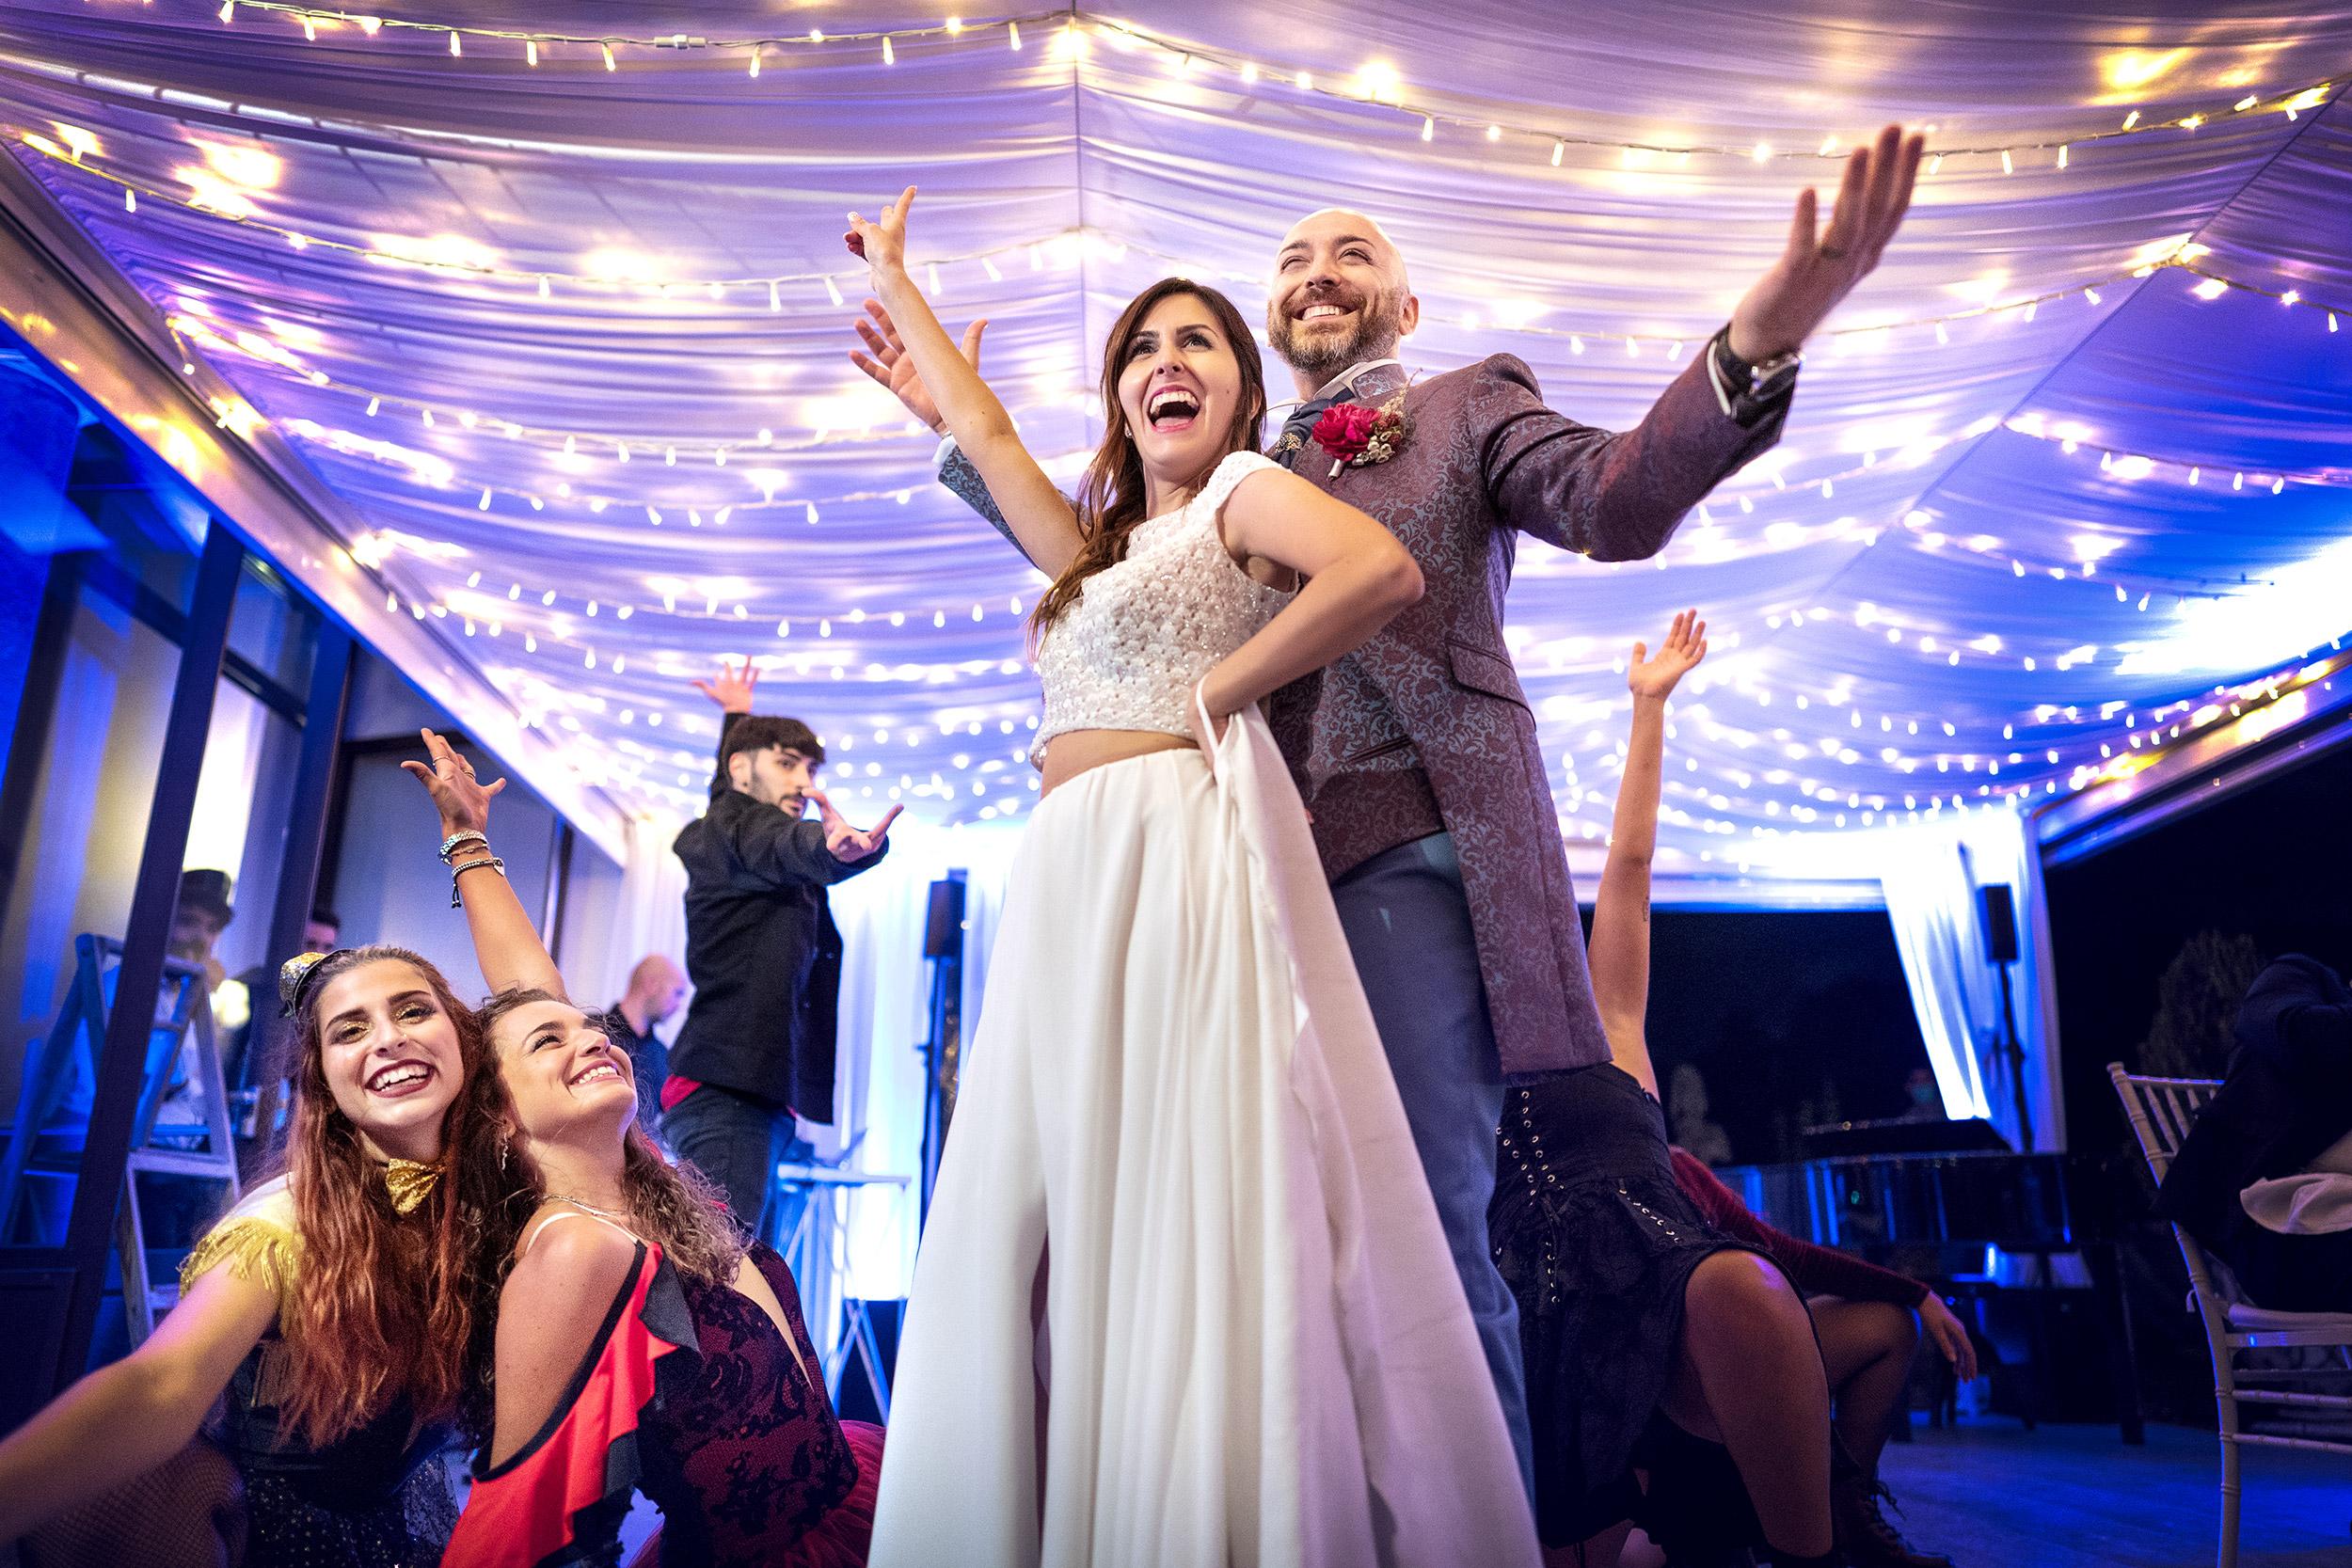 001 foto matrimonio reportage wedding bergamo castello marne 1